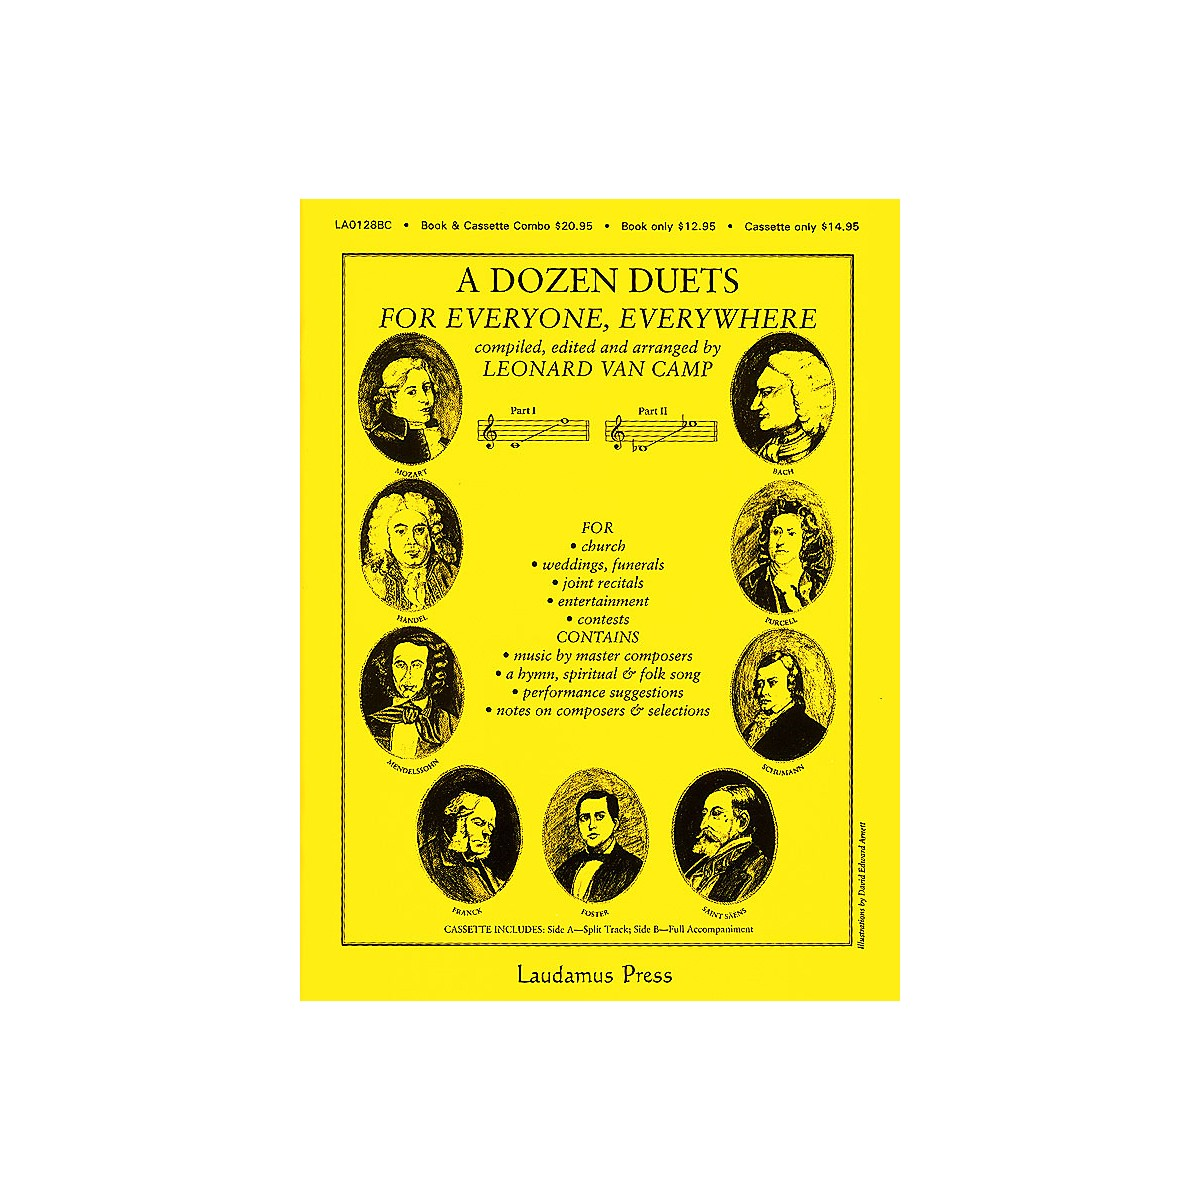 Laudamus Press A Dozen Duets - Vocal Duets (Compiled, edited and arranged by Leonard van Camp) by Leonard Van Camp